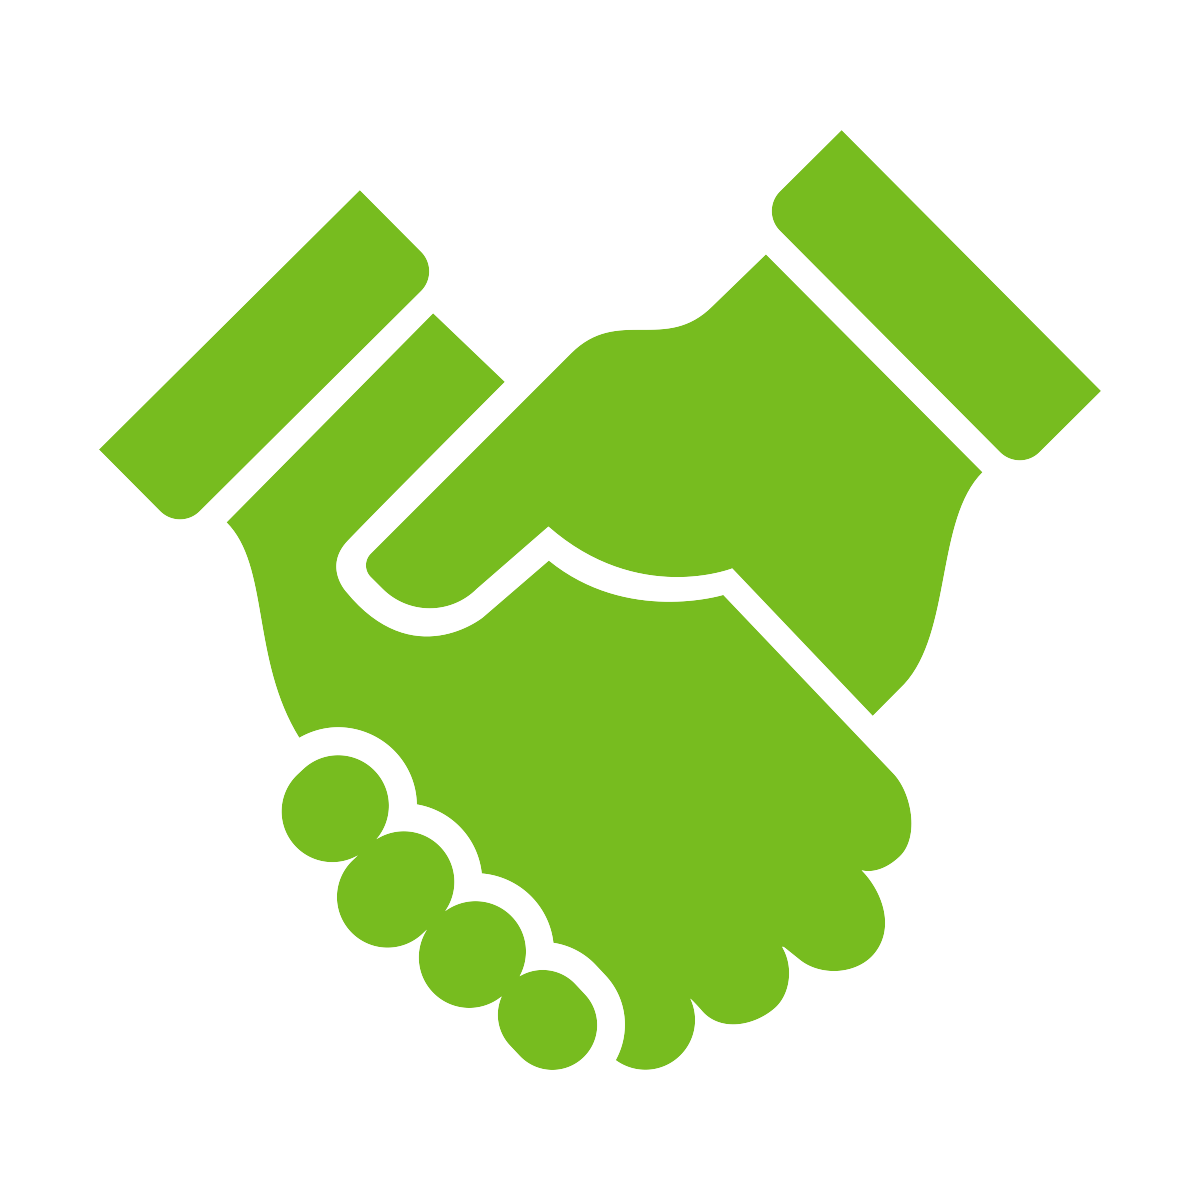 Handshake clipart respect. What we heard growing